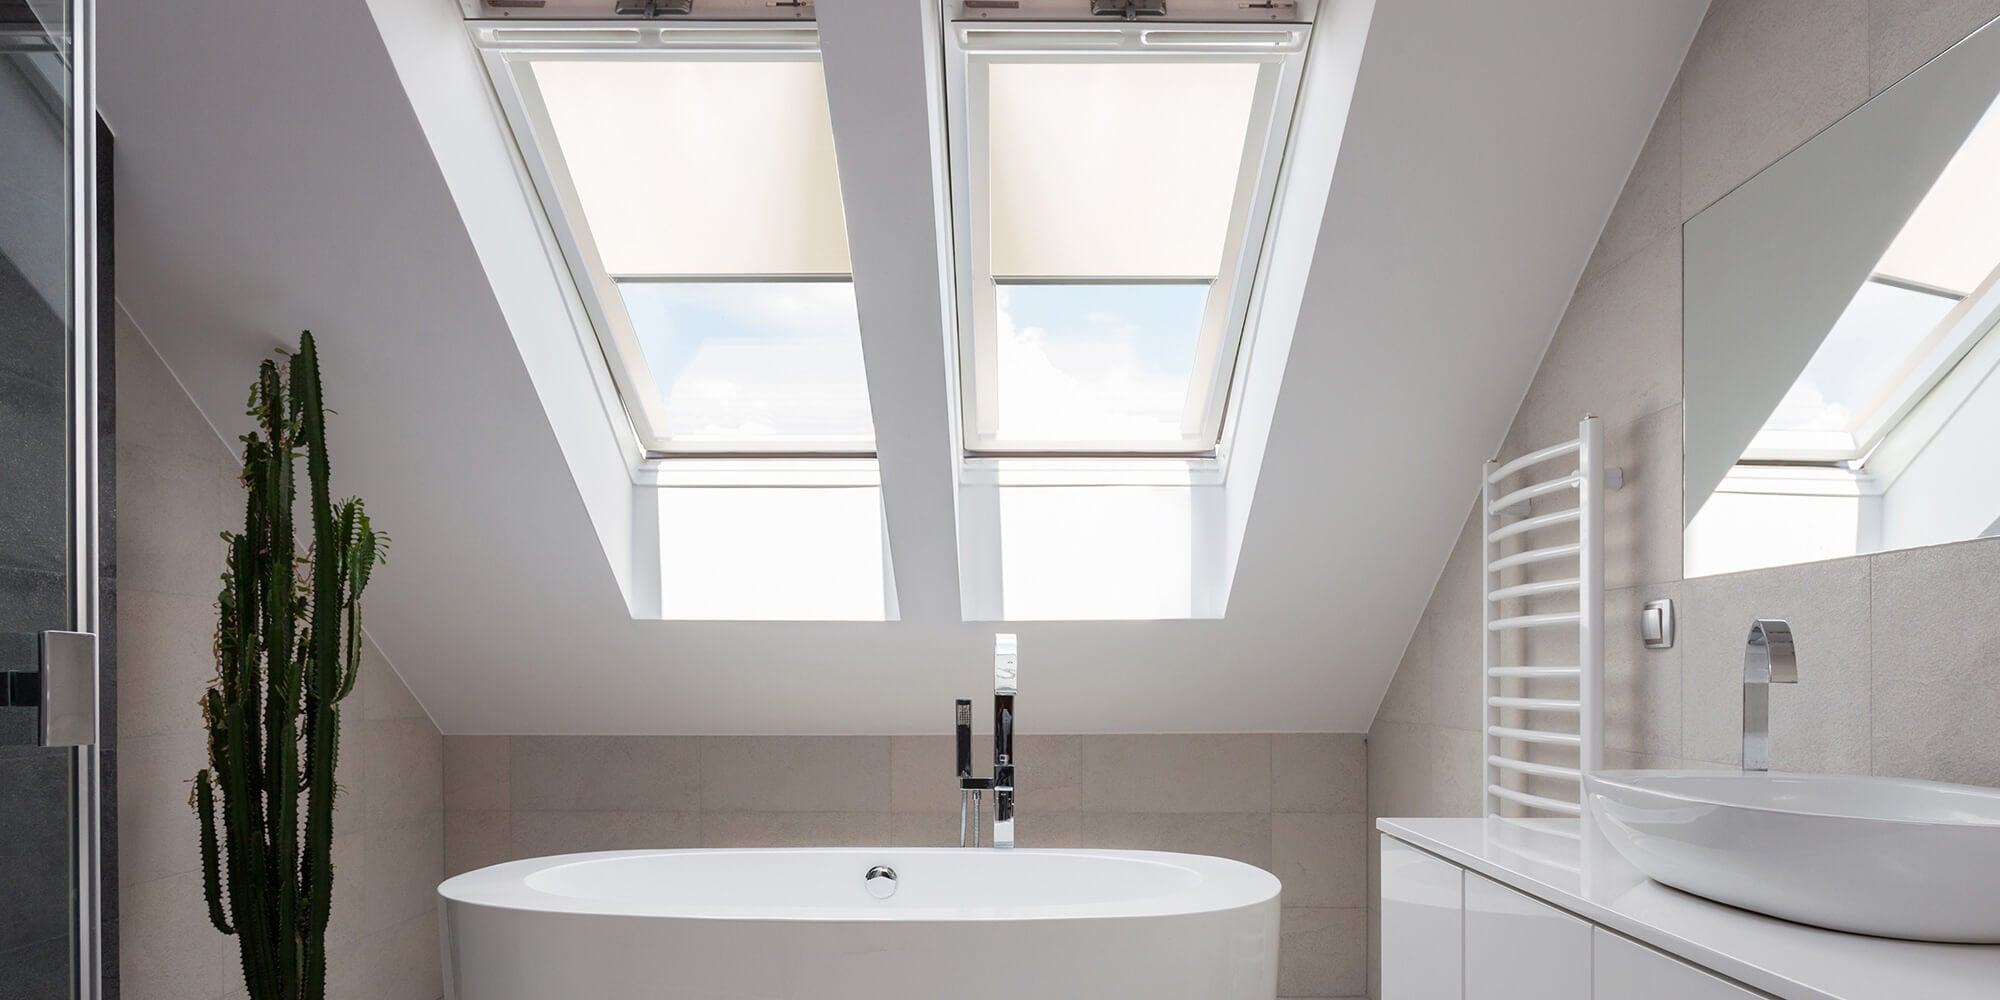 dachrollos passend f r velux roto fakro dachfenster. Black Bedroom Furniture Sets. Home Design Ideas